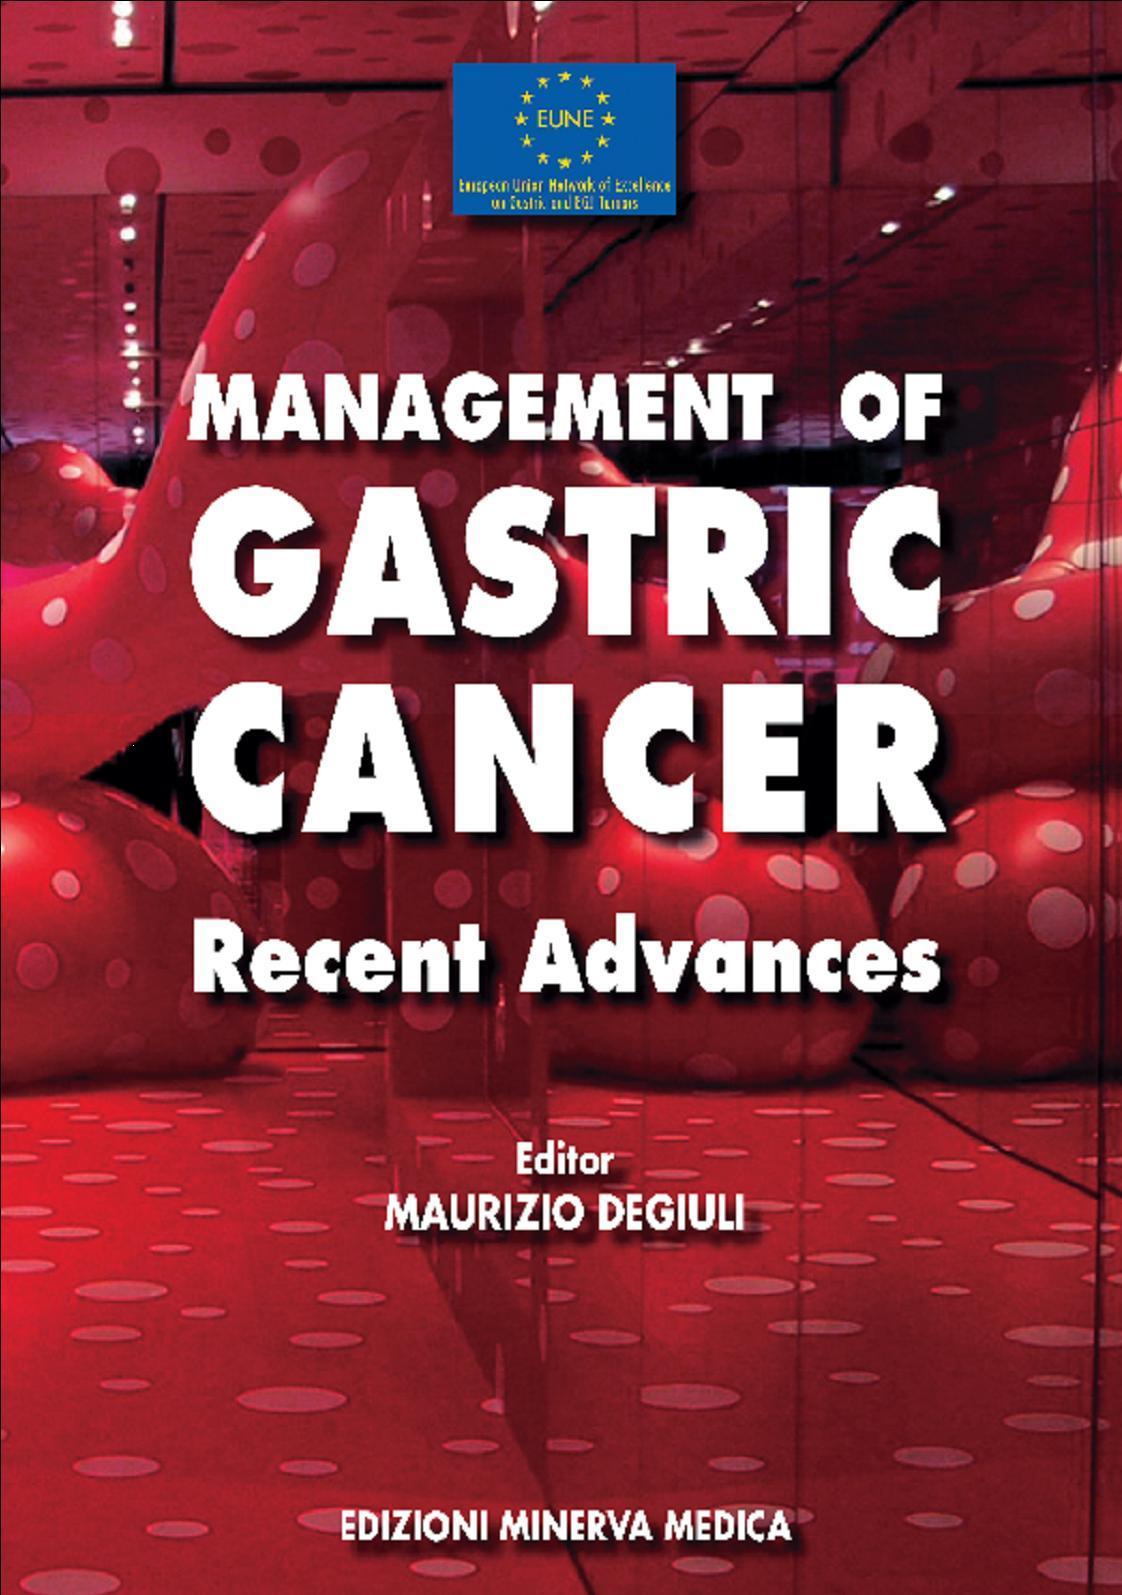 Management of gastric cancer - Recent advances